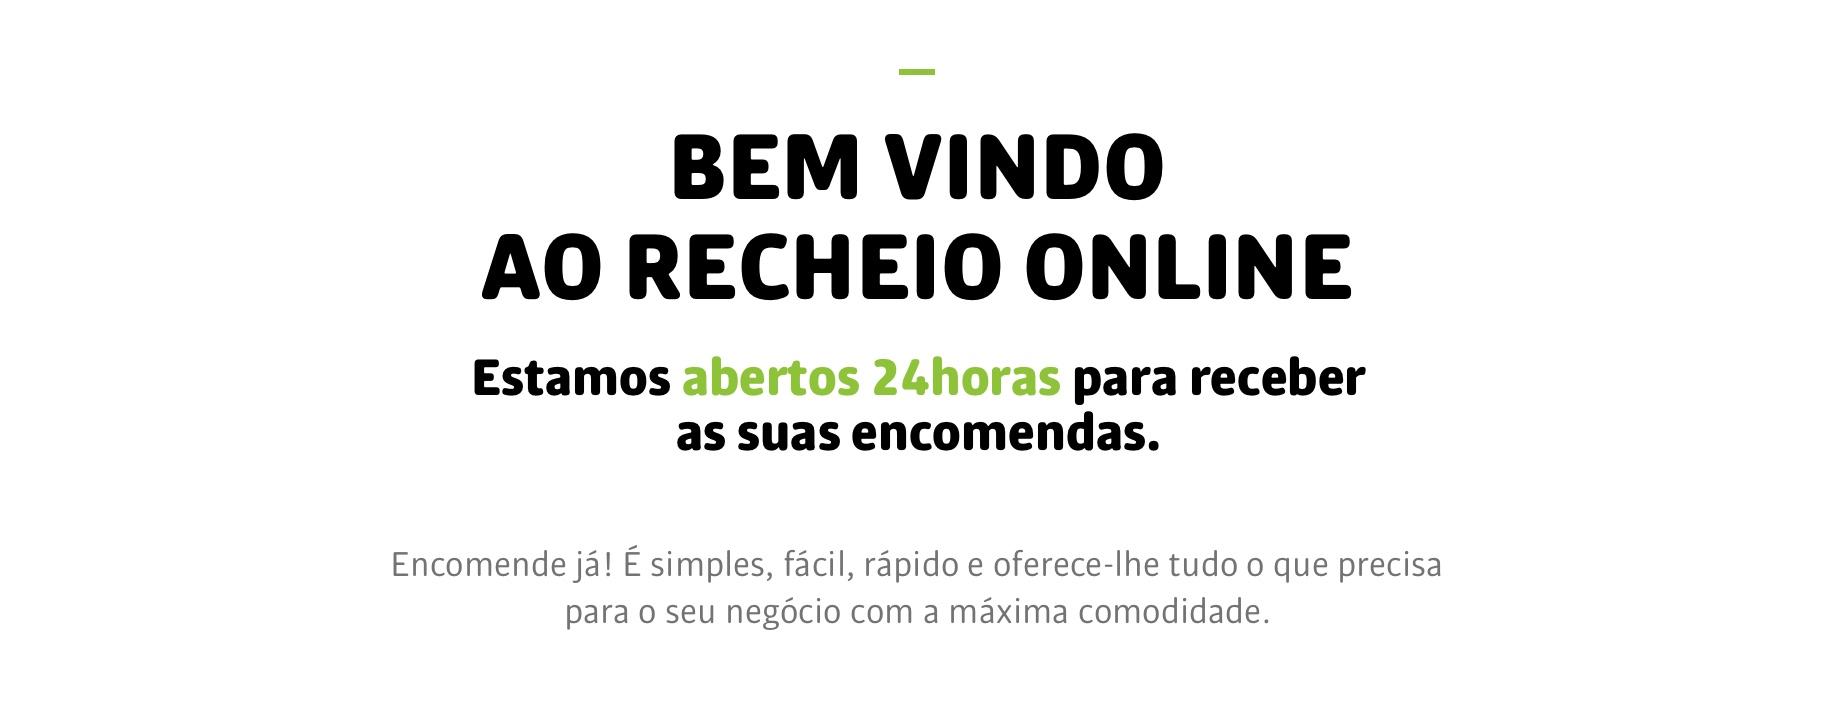 Recheio_LP_BemVindo_Bloco01